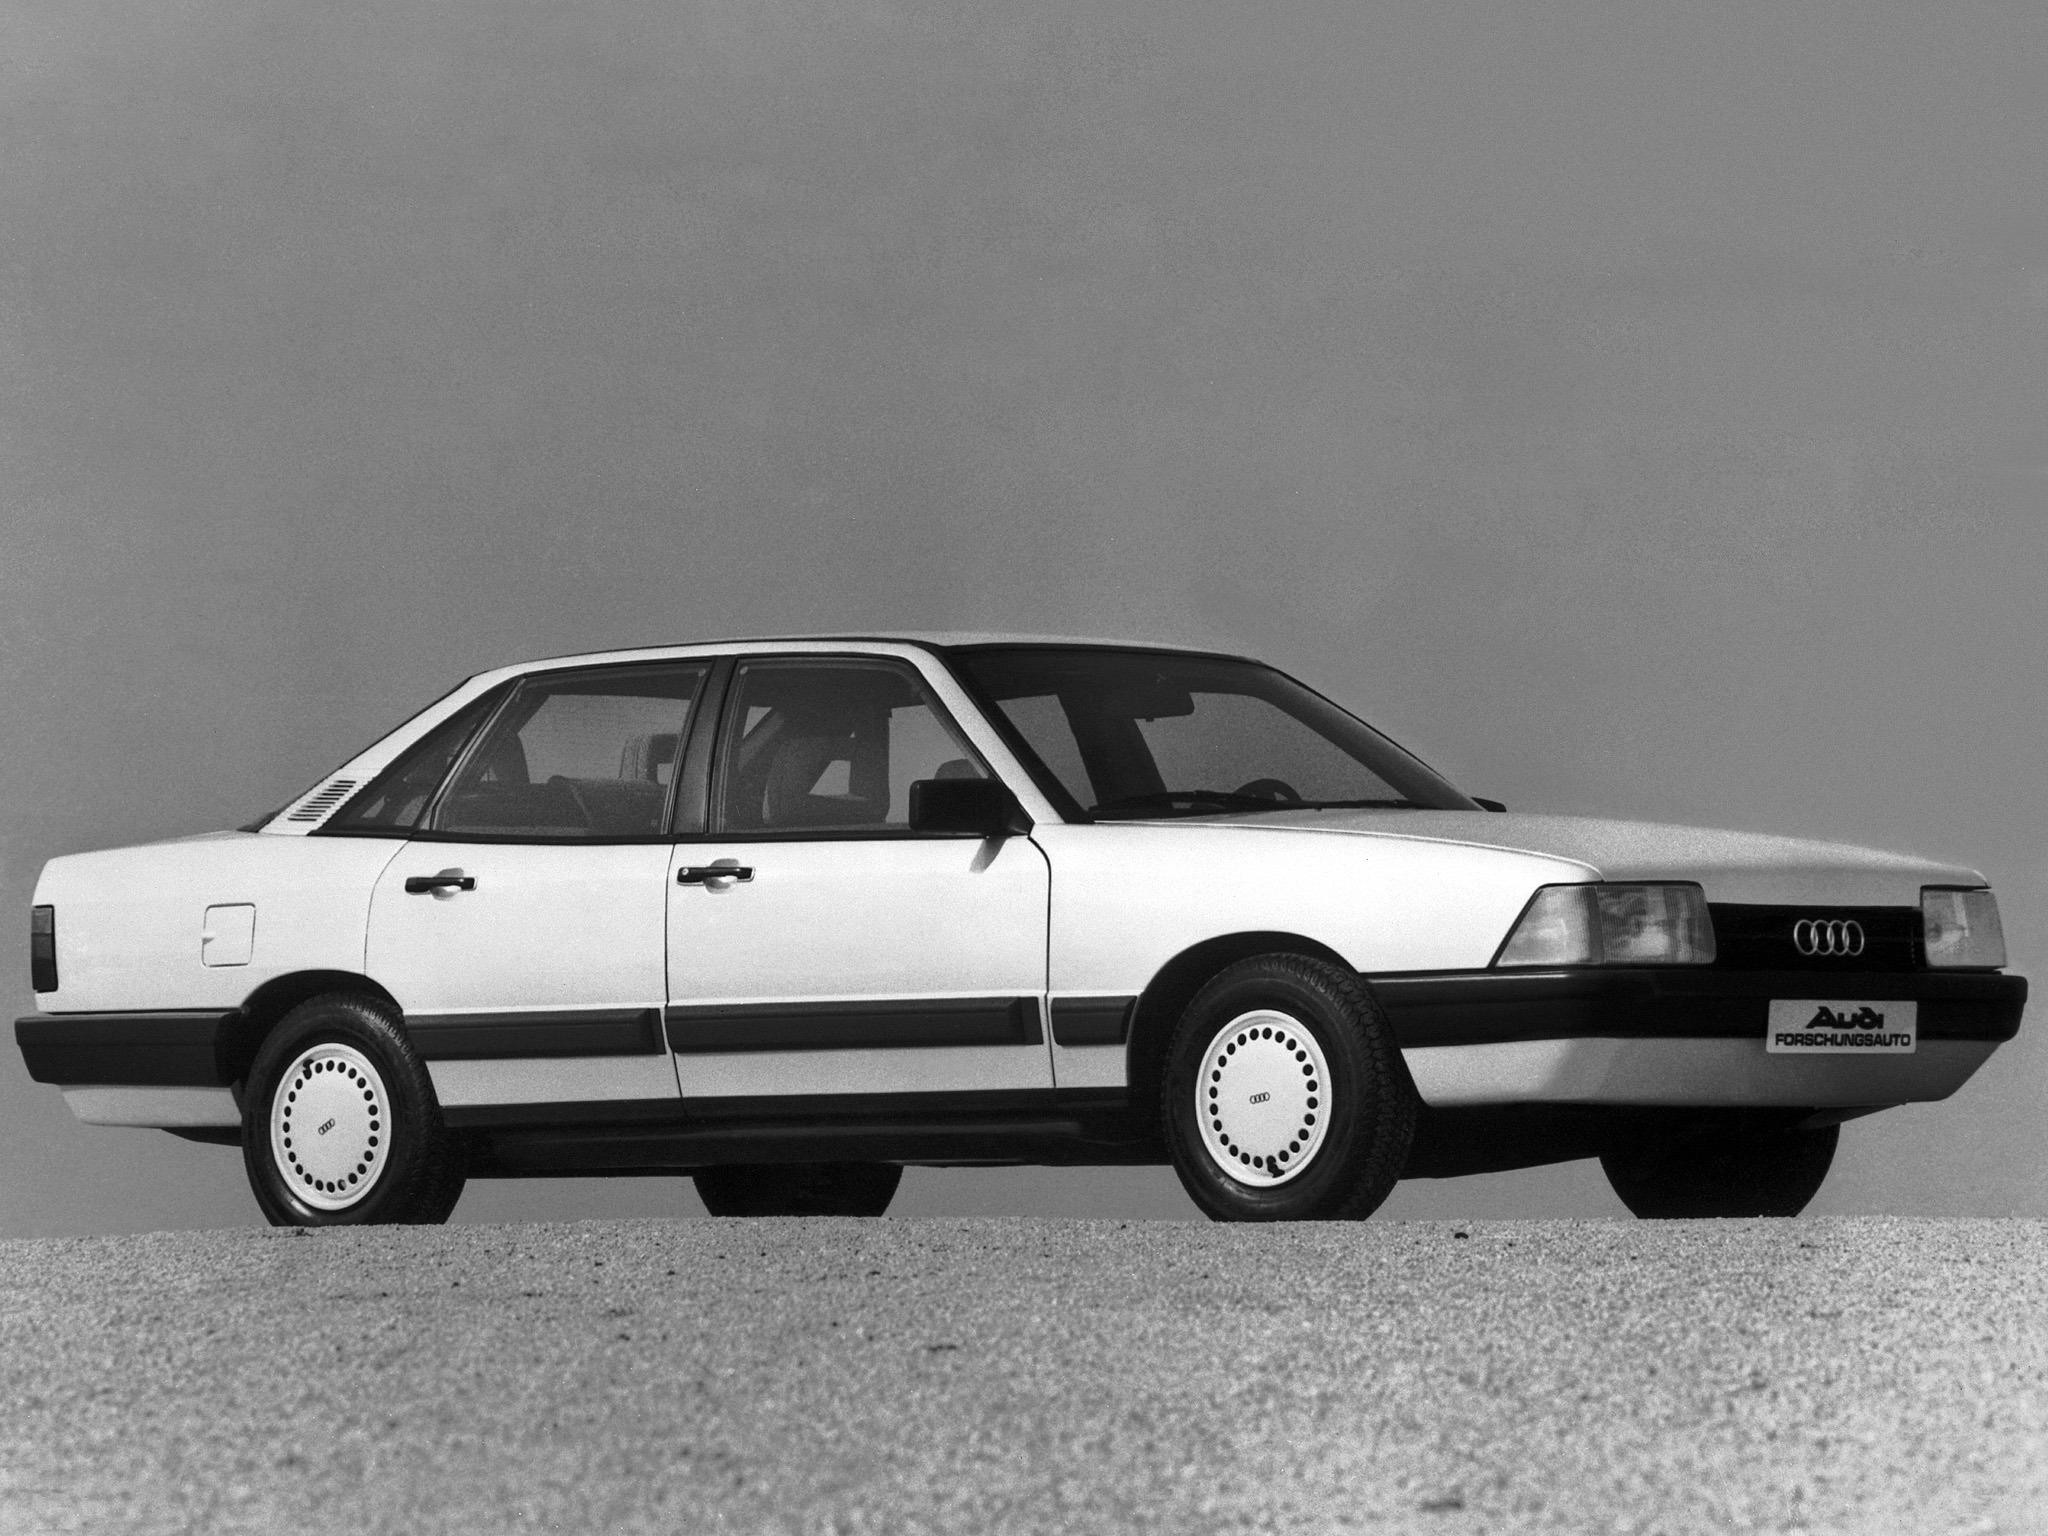 Audi 2000 Concept (1981) – Old Concept Cars